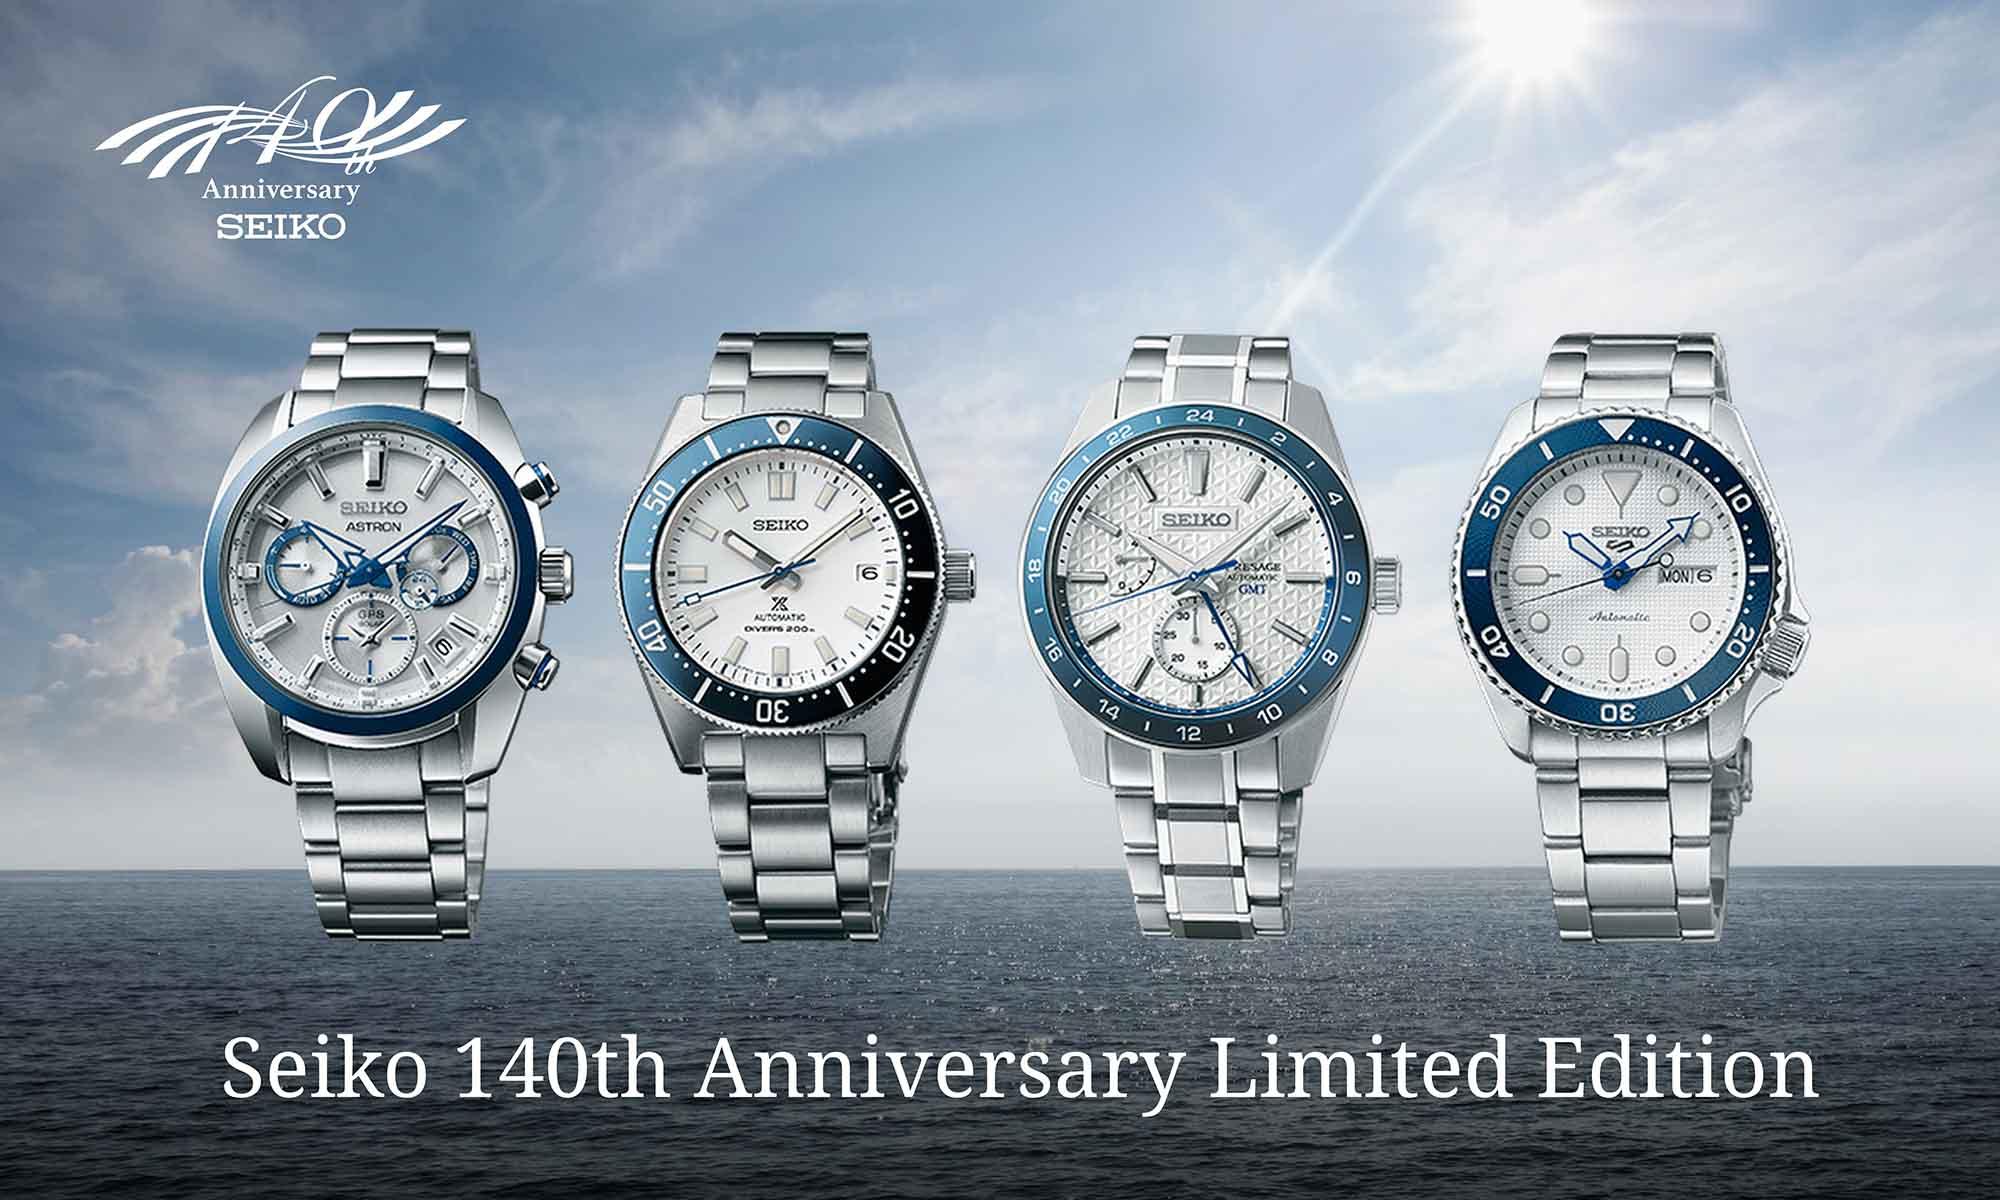 Seiko 140th Anniversary Limited Edition